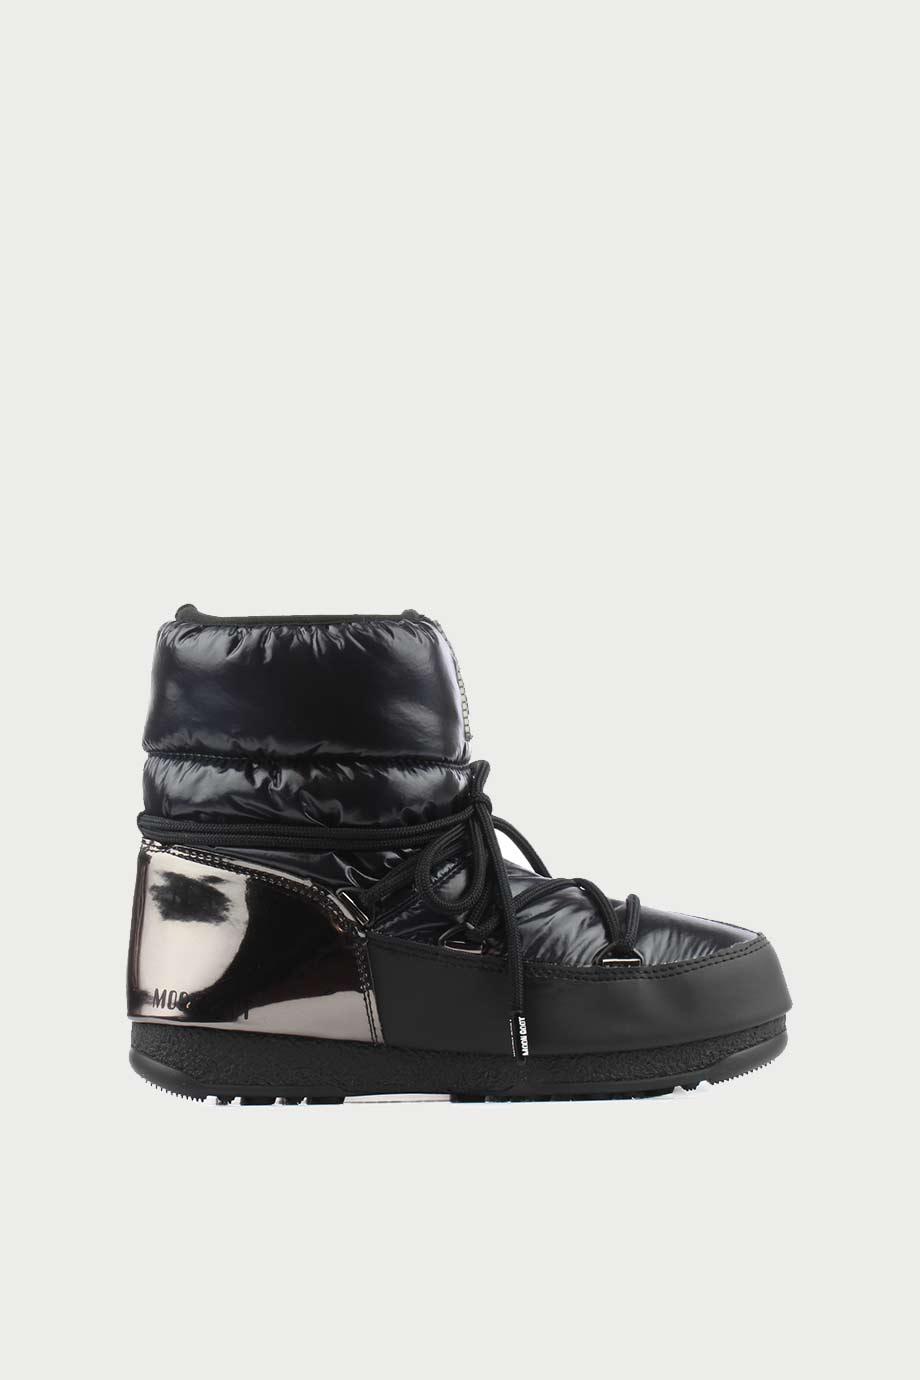 spiridoula metheniti shoes xalkida p 24009800 001 black low laces MoonBoot 4